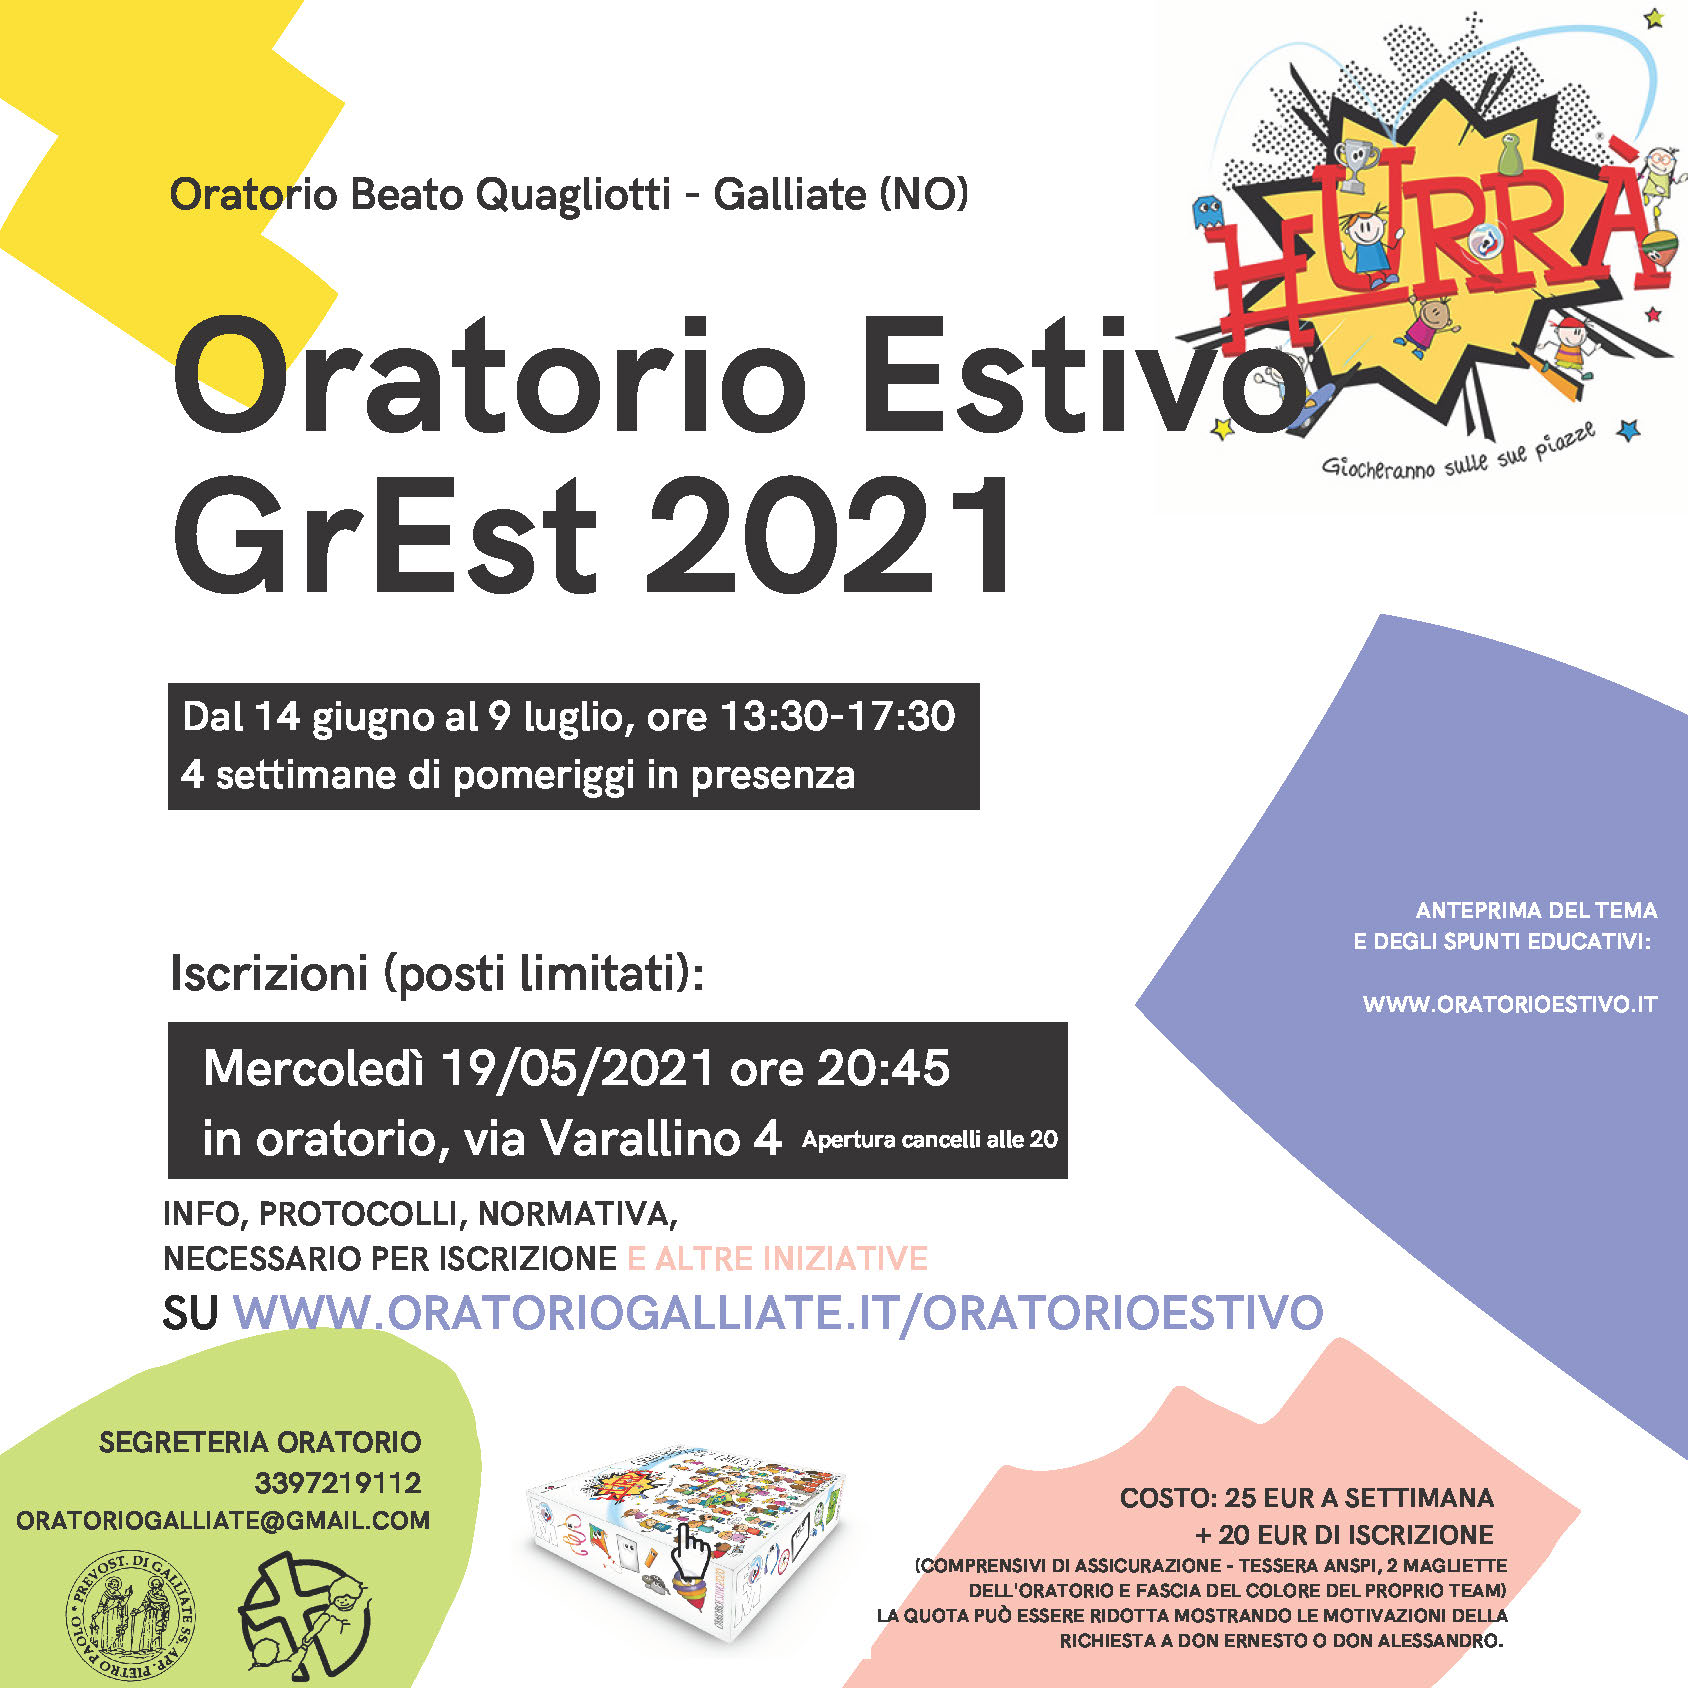 Oratorio Estivo – GrEst – 2021